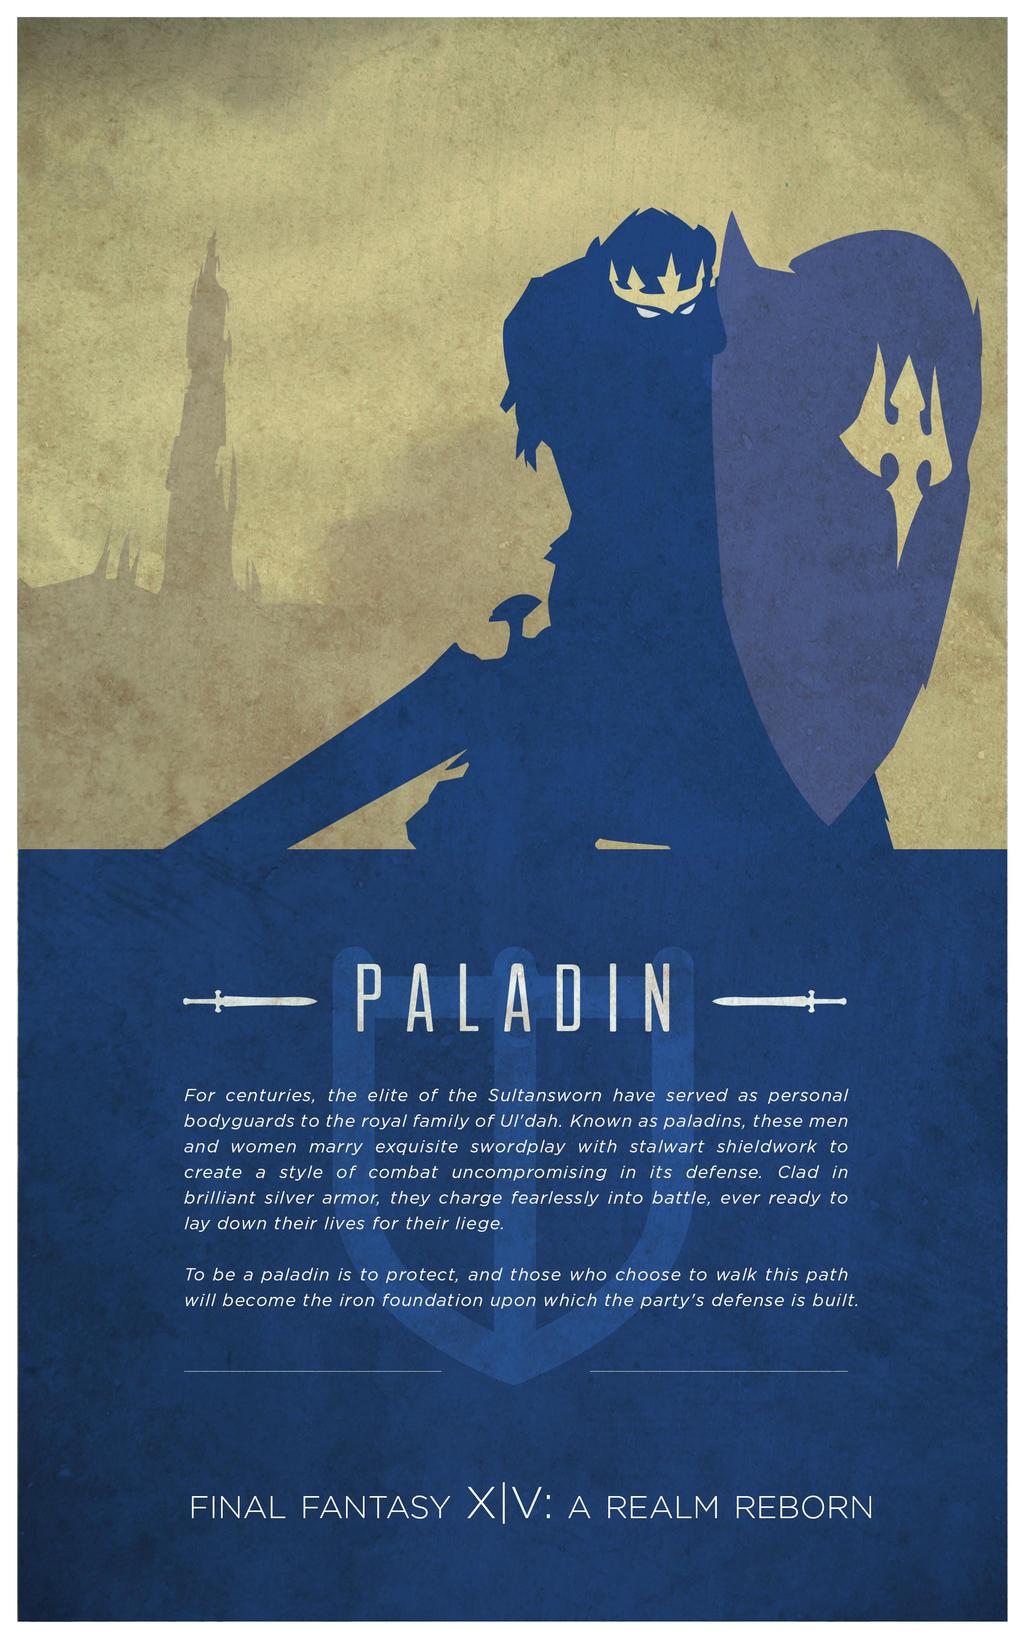 Paladin [Final Fantasy XIV] by fredjully on DeviantArt